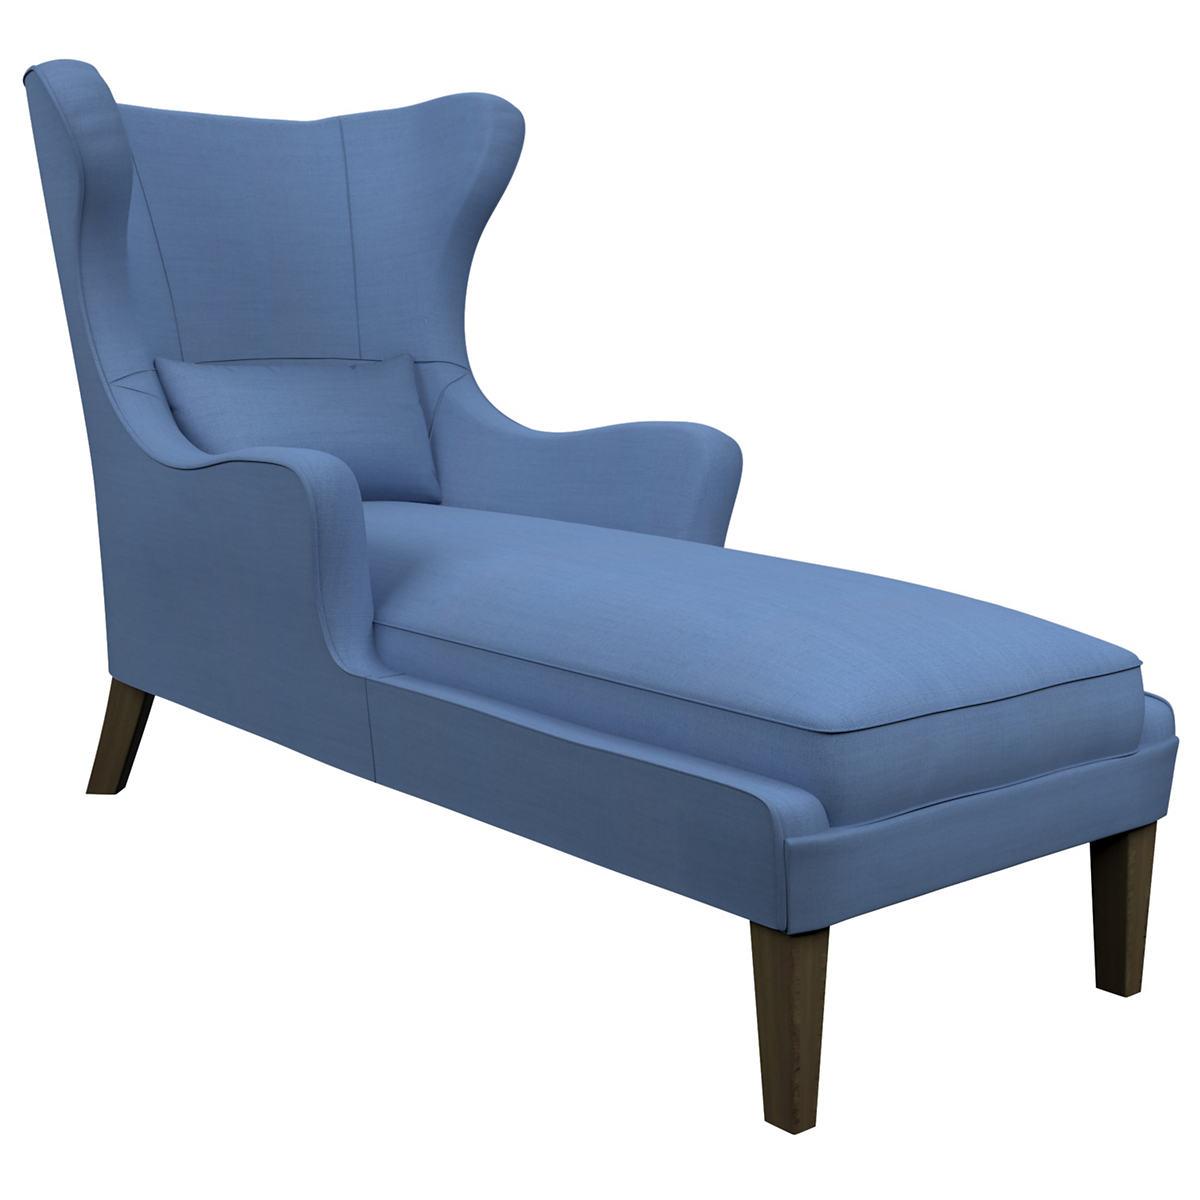 Estate Linen French Blue Mirage Smoke Chaise